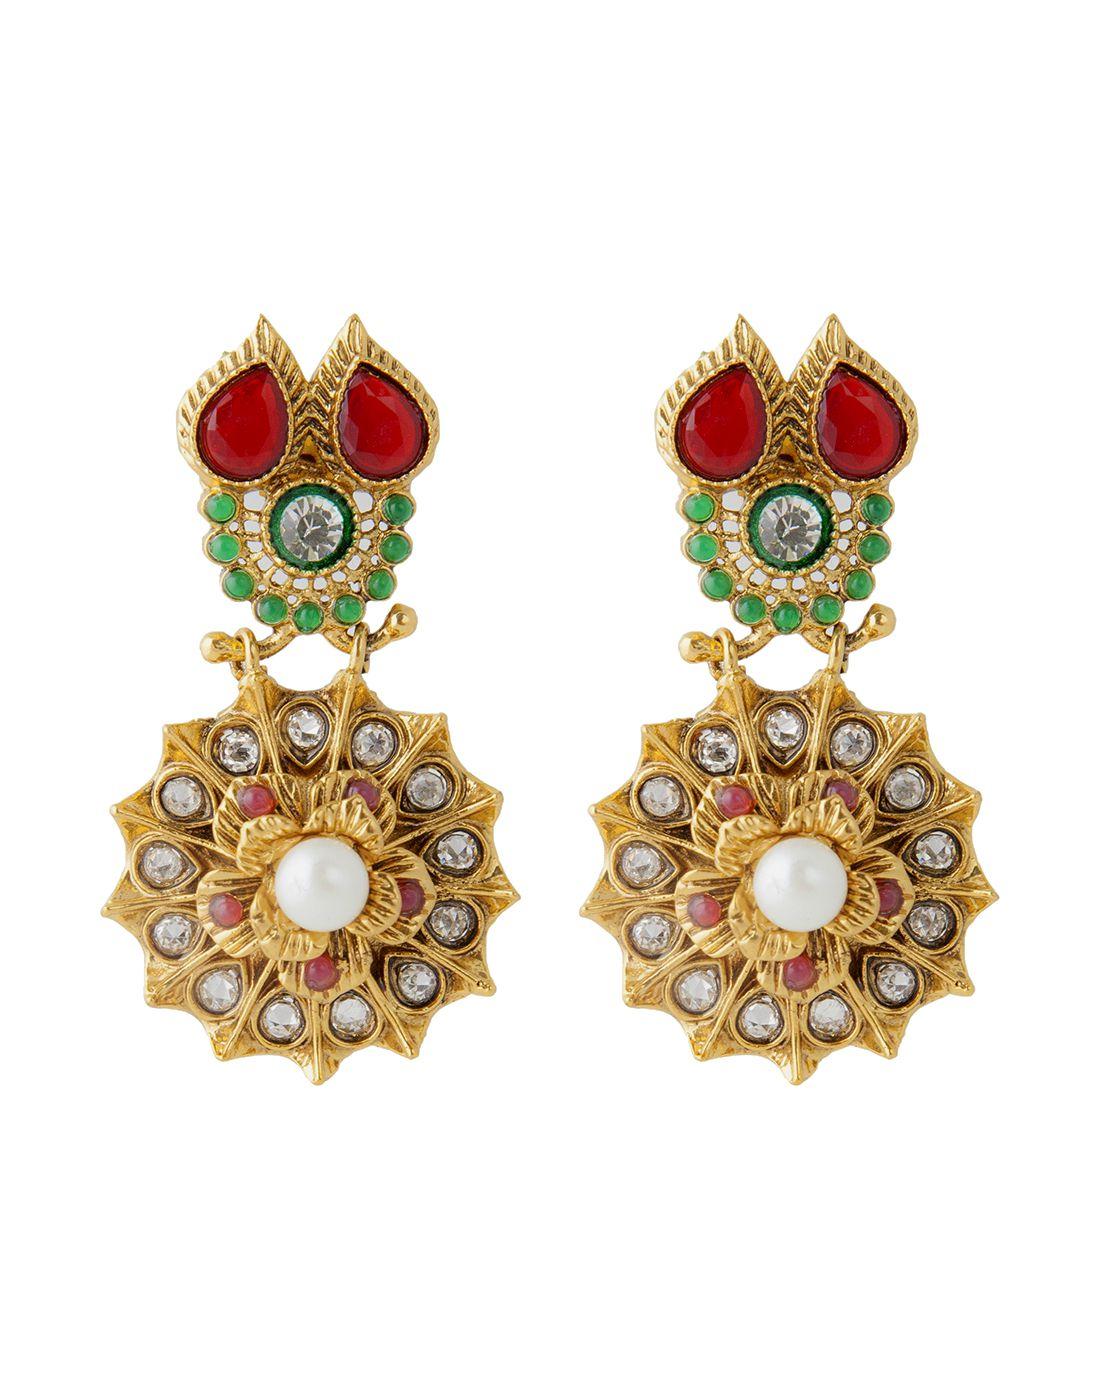 Kundan Beautiful Big Designer Dangler Flower Earrings in Maroon Green